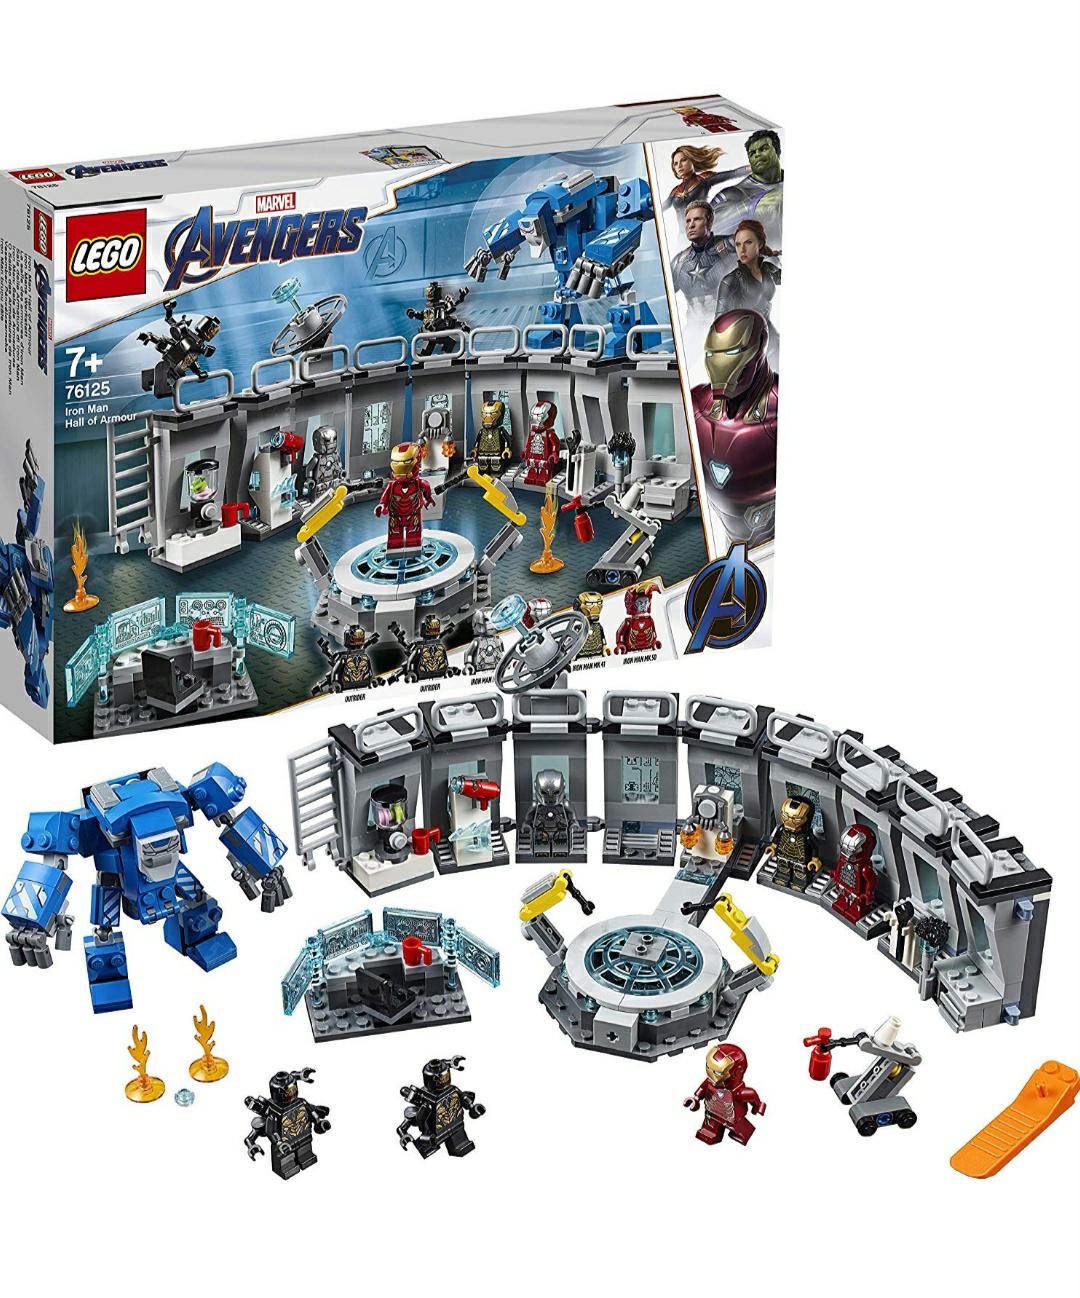 Lego Marvel Superheroes 76125 Iron Man's Werkstatt [Prime Day]